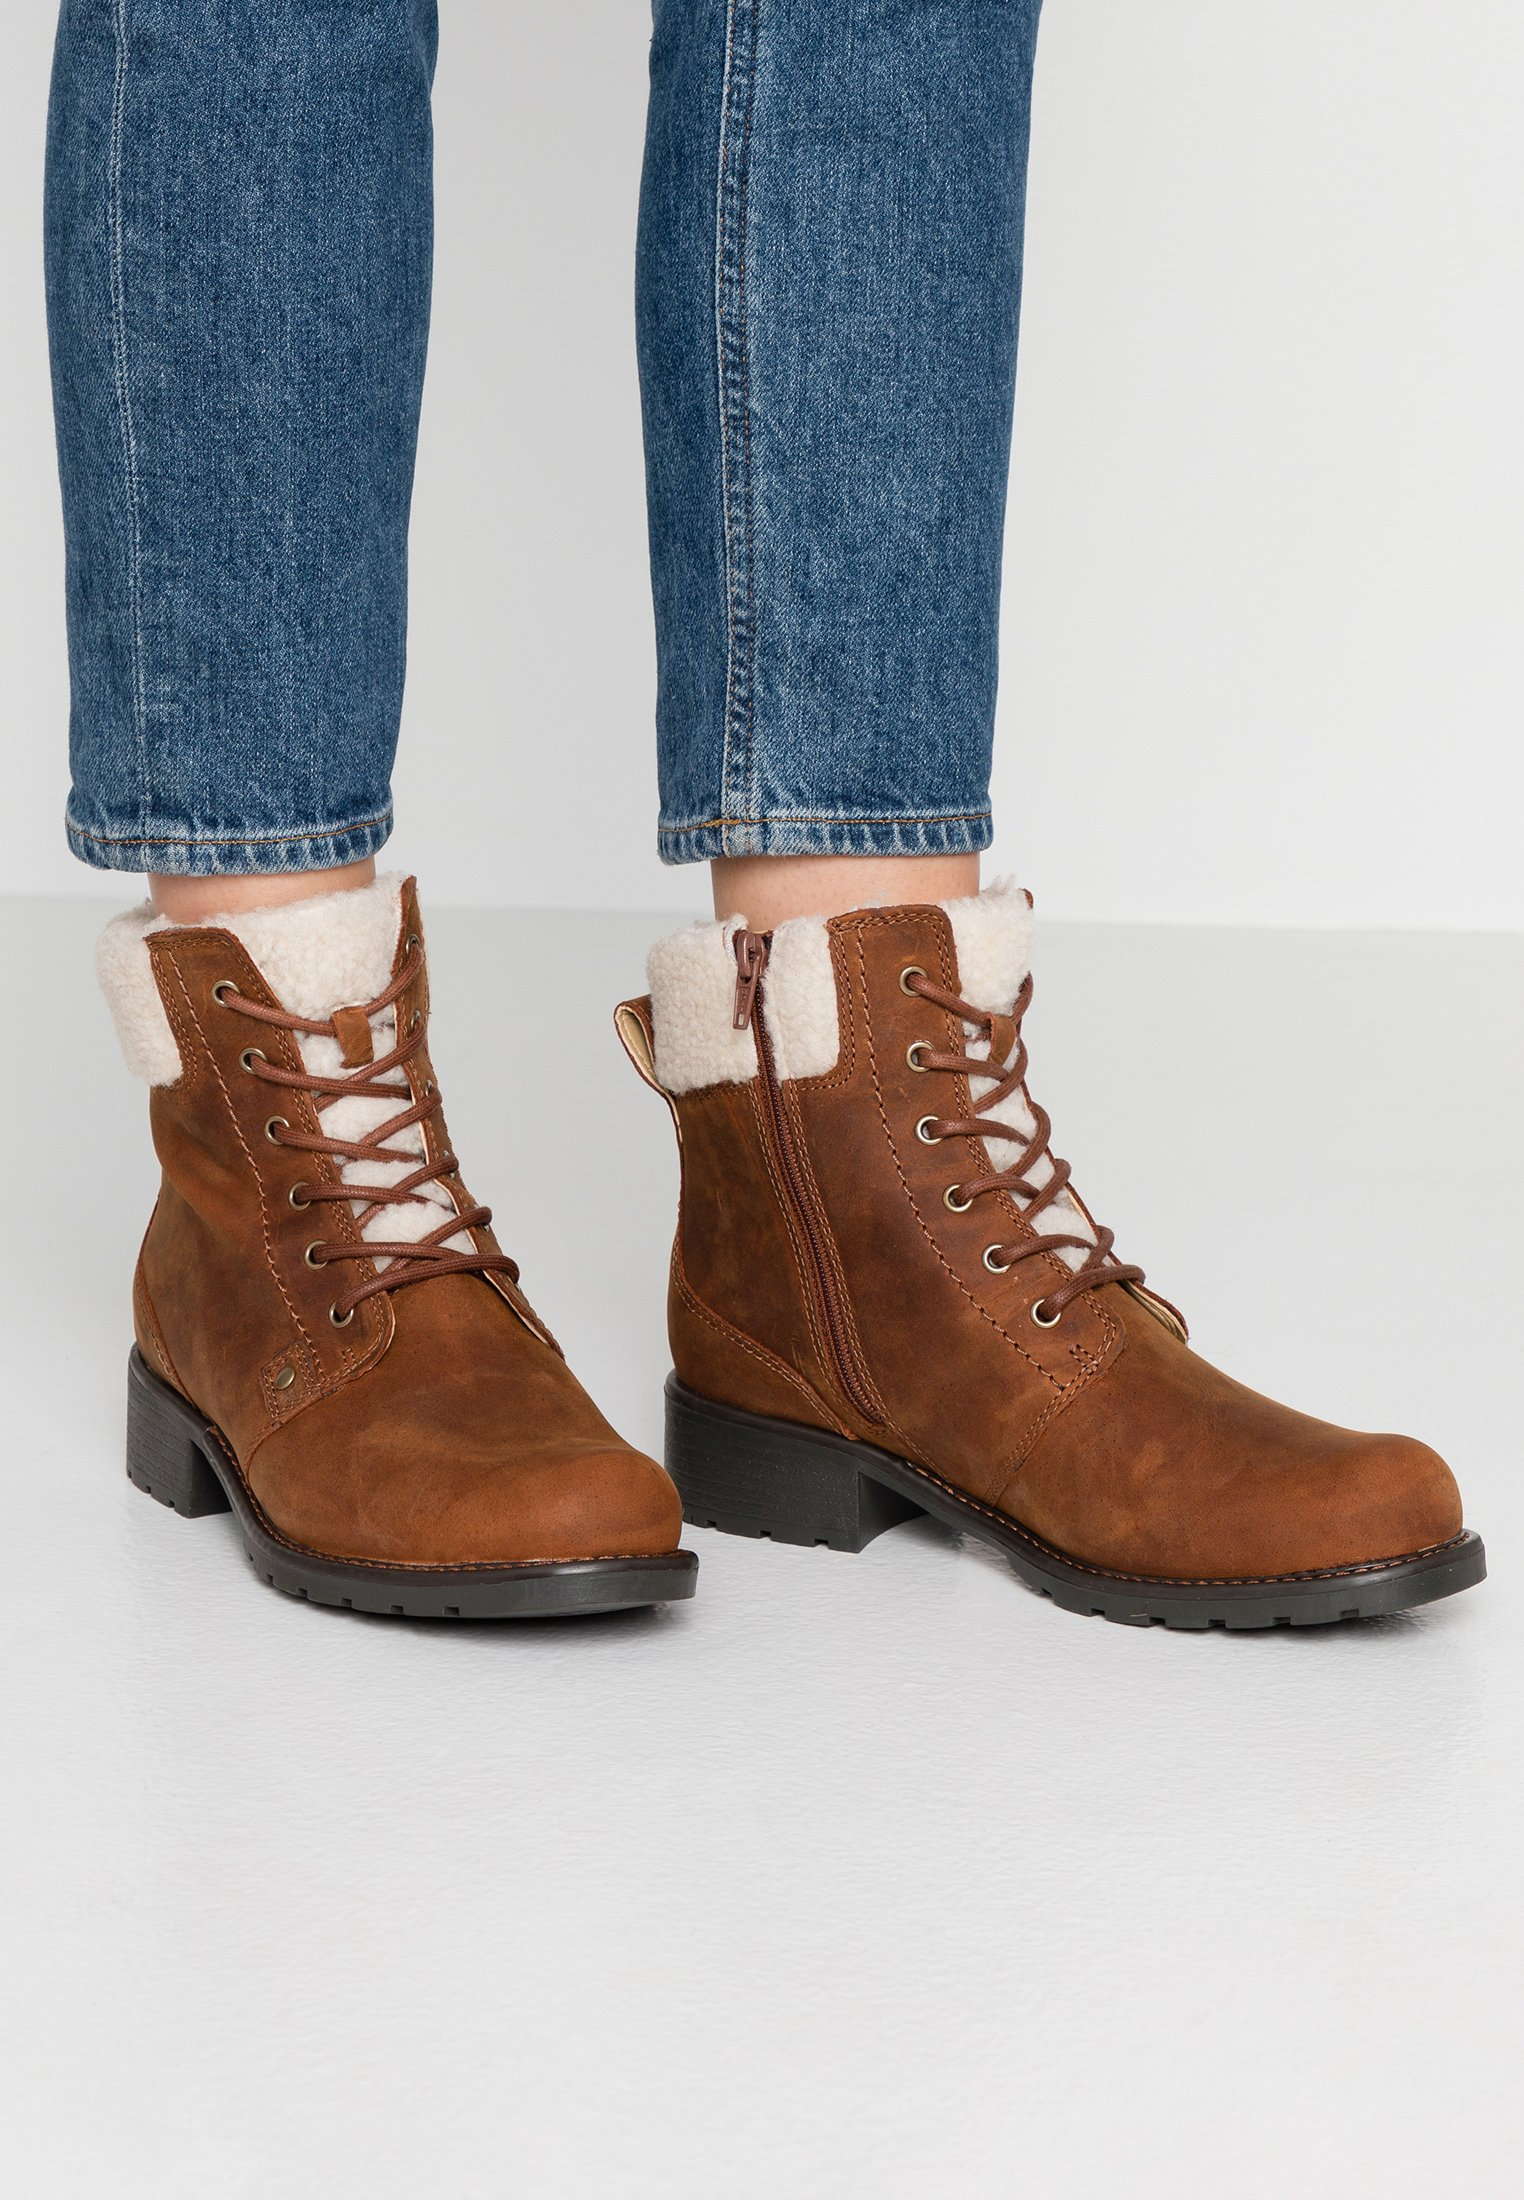 Clarks Orinoco Dusk Chaussures Women Bottes Femmes Bottines Doublure 26146418